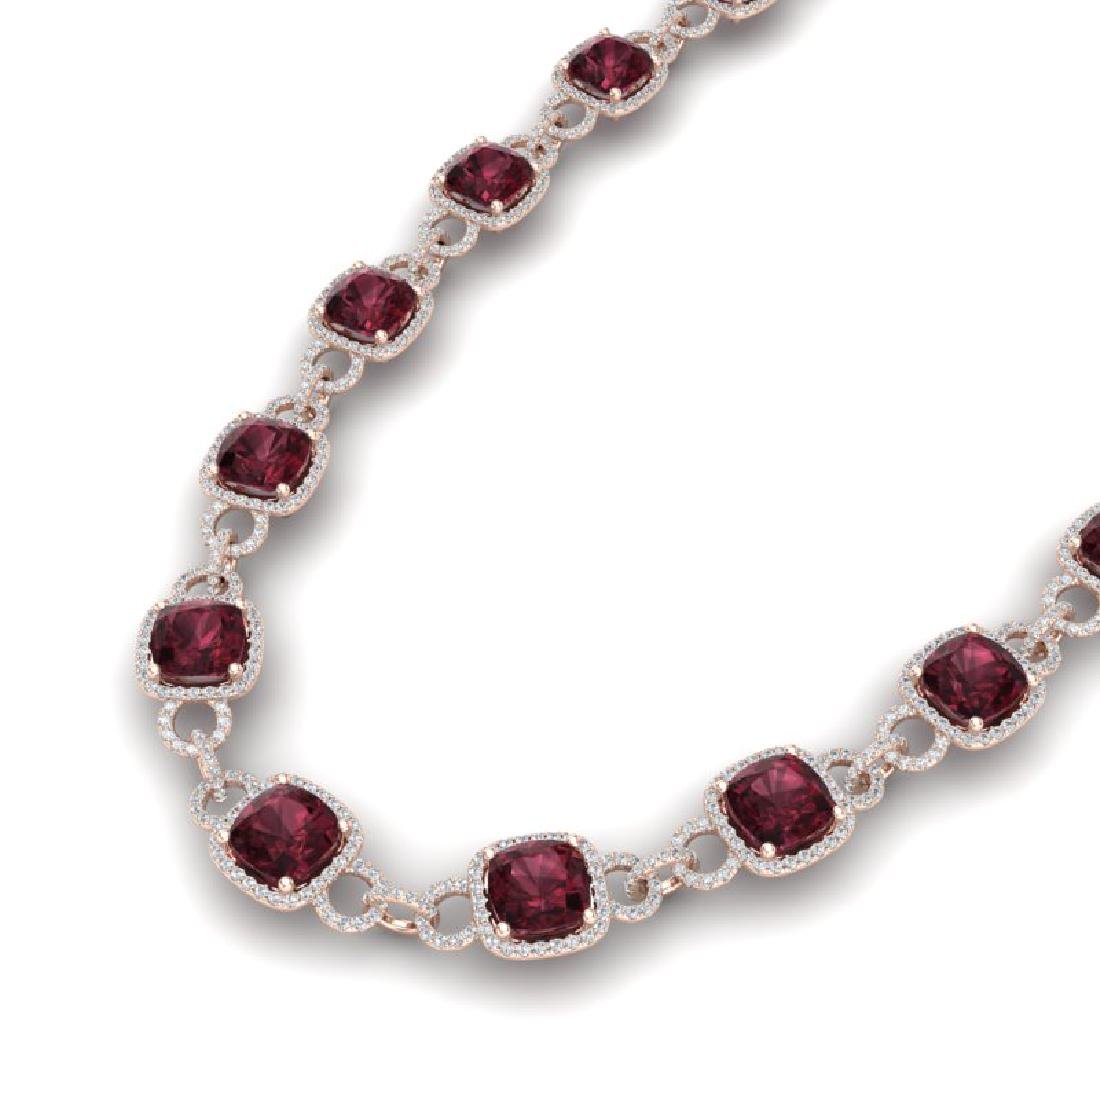 66 CTW Garnet & VS/SI Diamond Necklace 14K Rose Gold